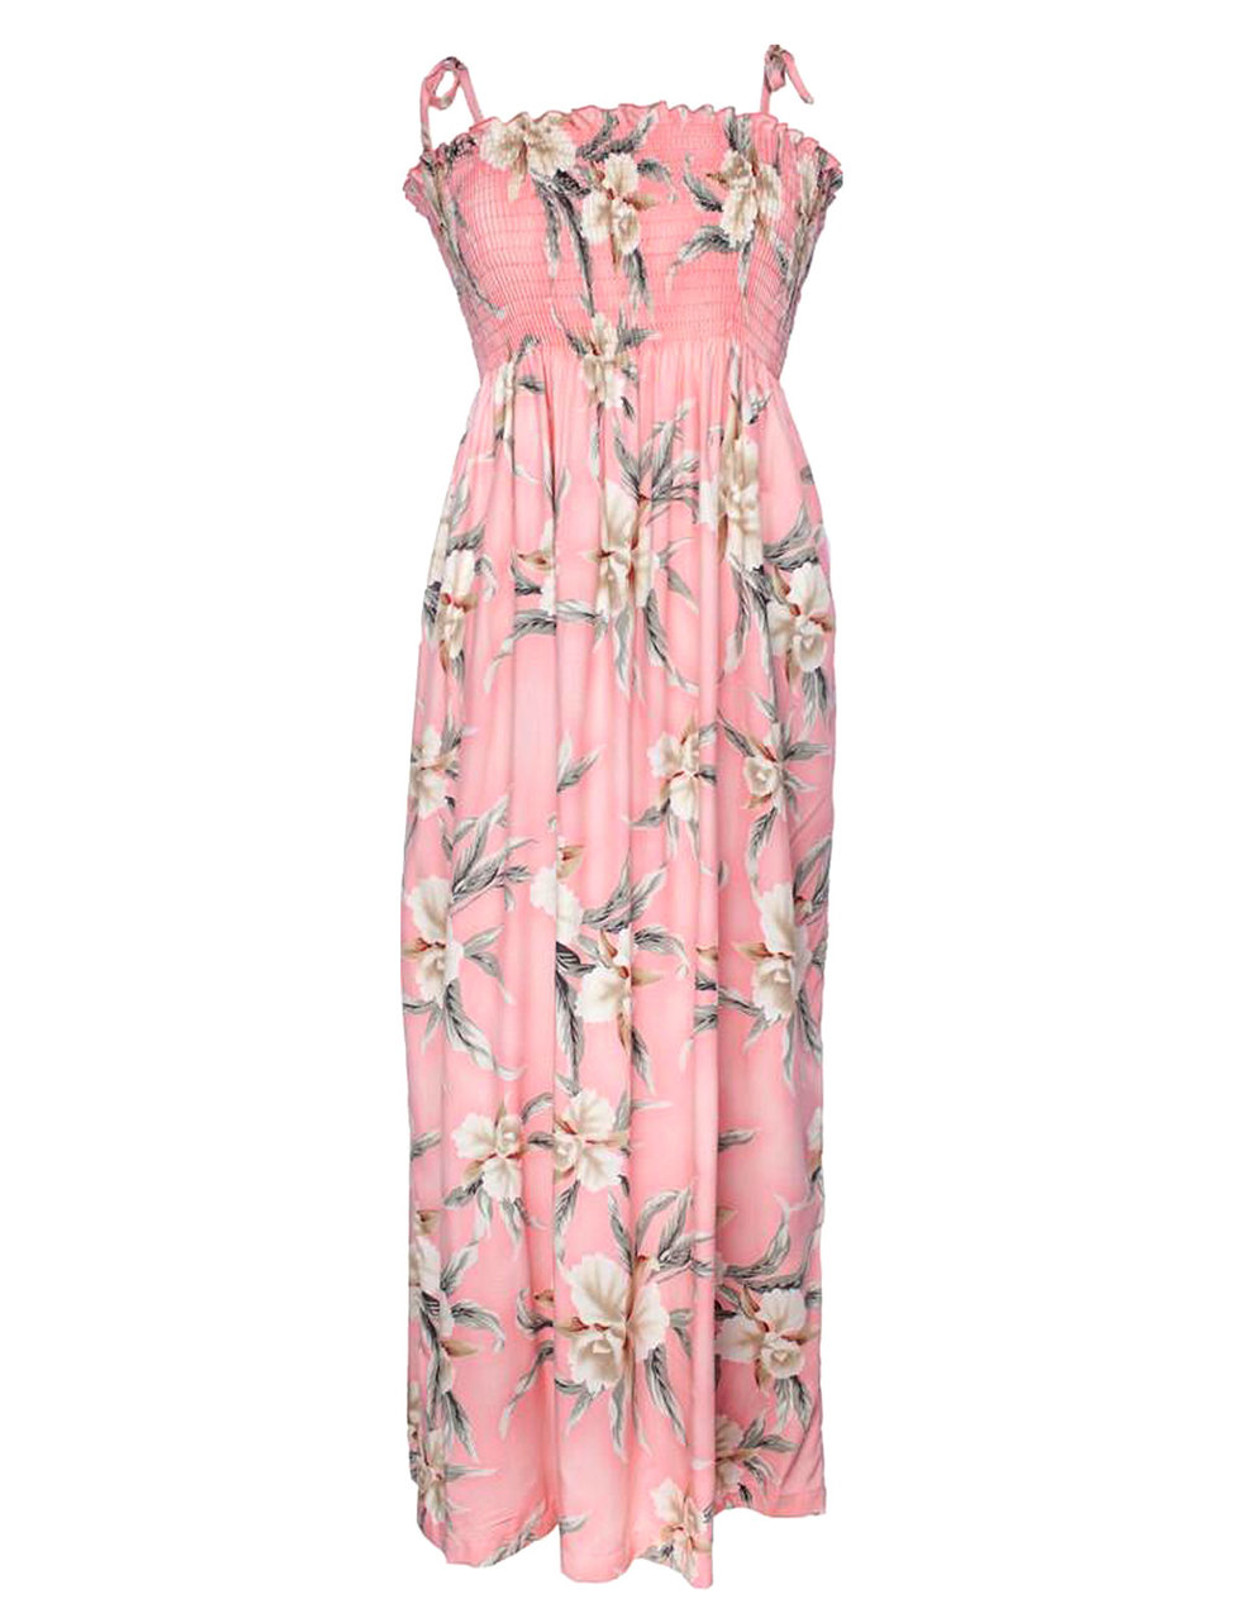 cf9545feedc Malana Long Smocked Tube Top Dress - Hawaiian Wedding Place